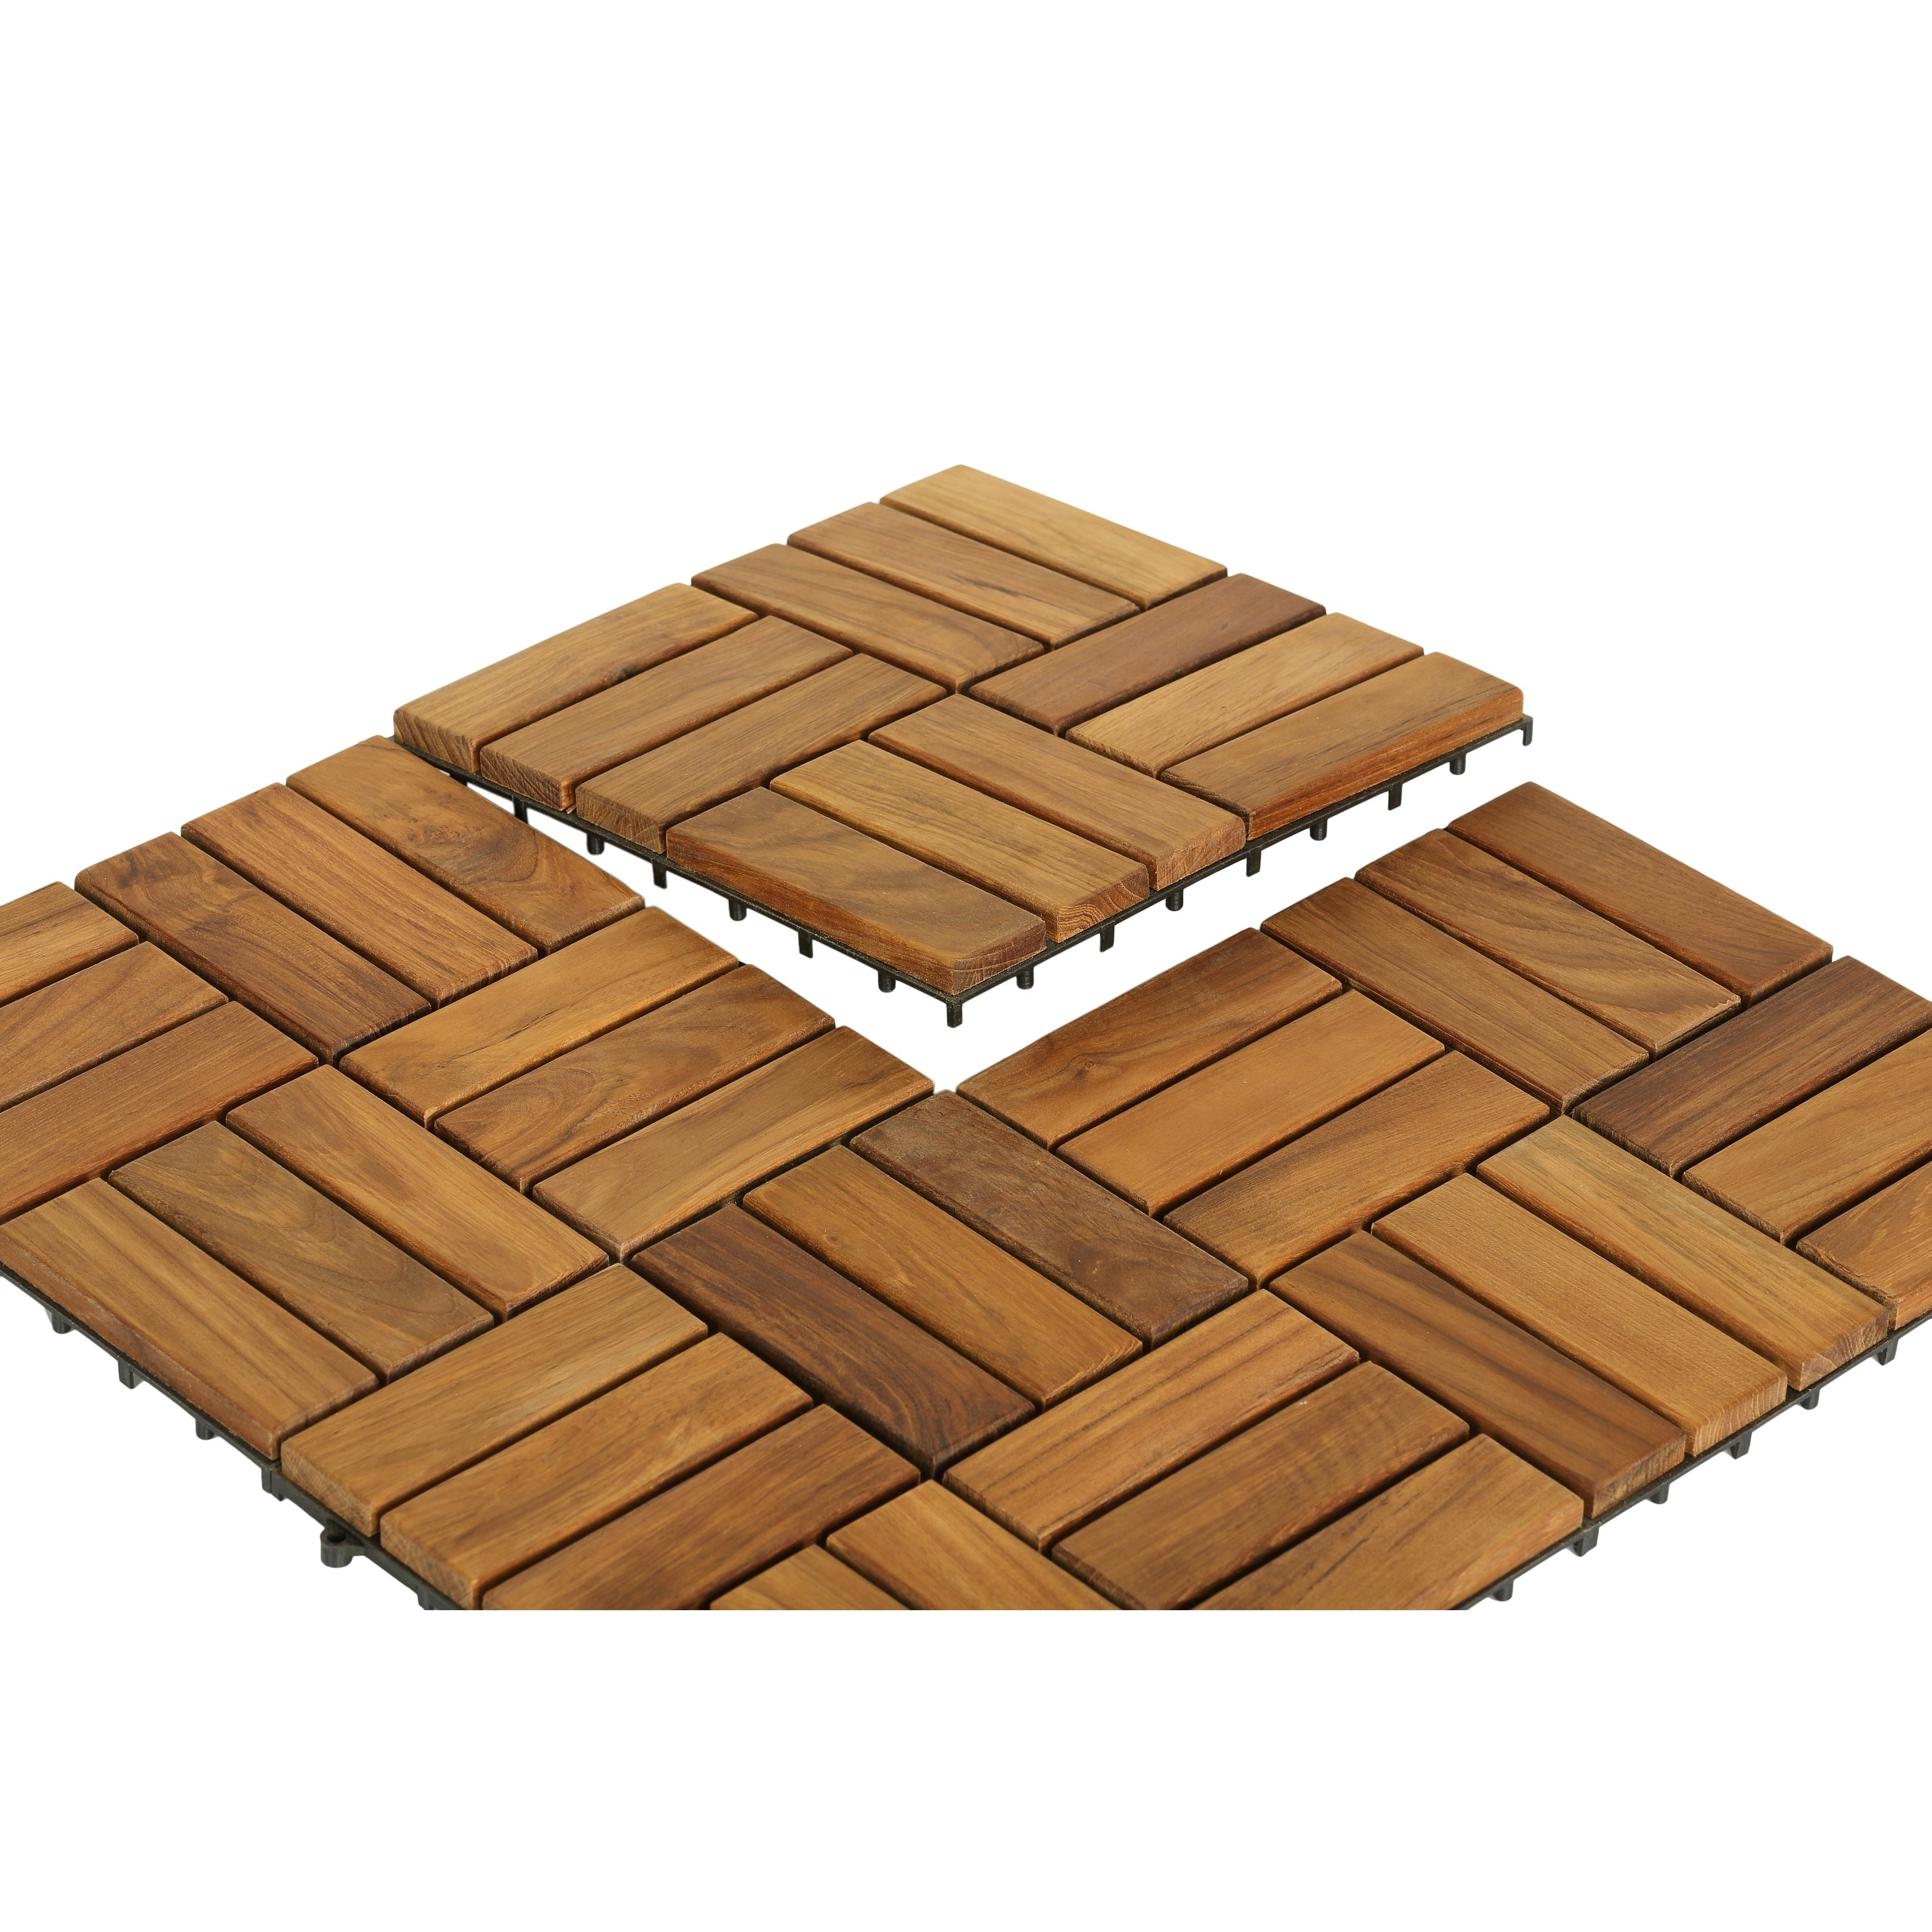 Bare Decor EZ Floor Interlocking Flooring Tiles in Solid Teak Wood